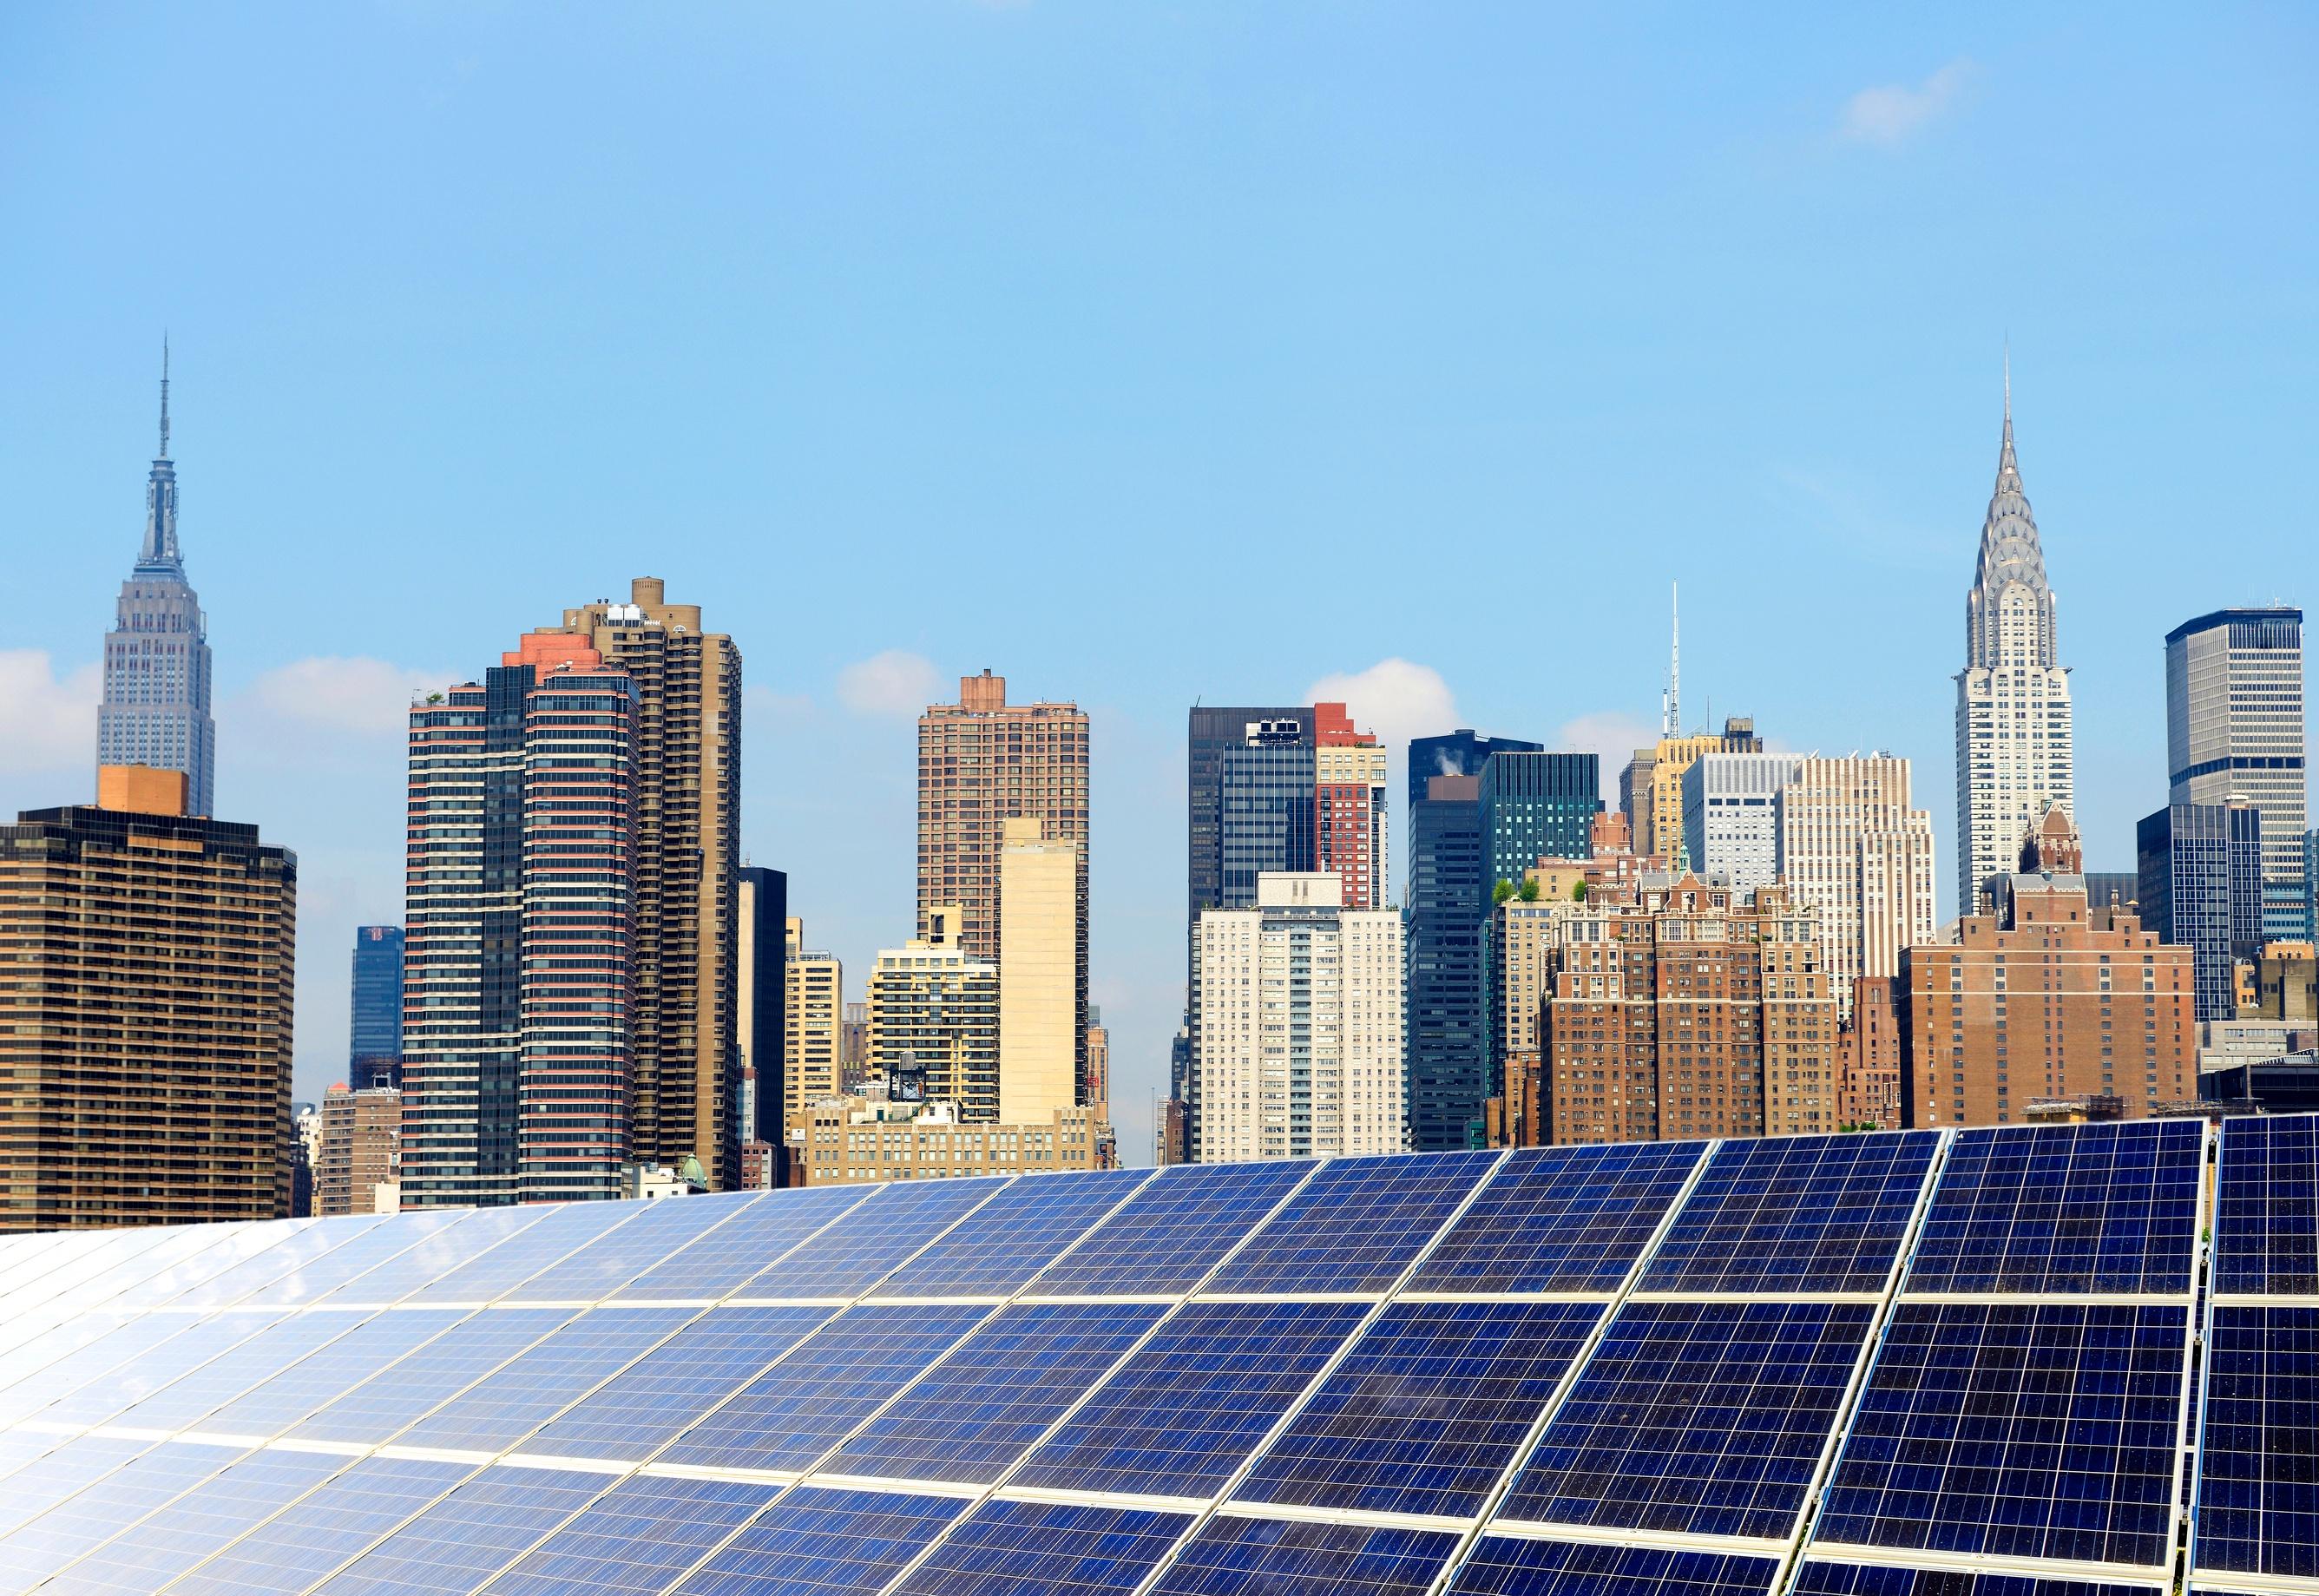 New_York_Clean_Energy_Standard_Solar-1.jpg